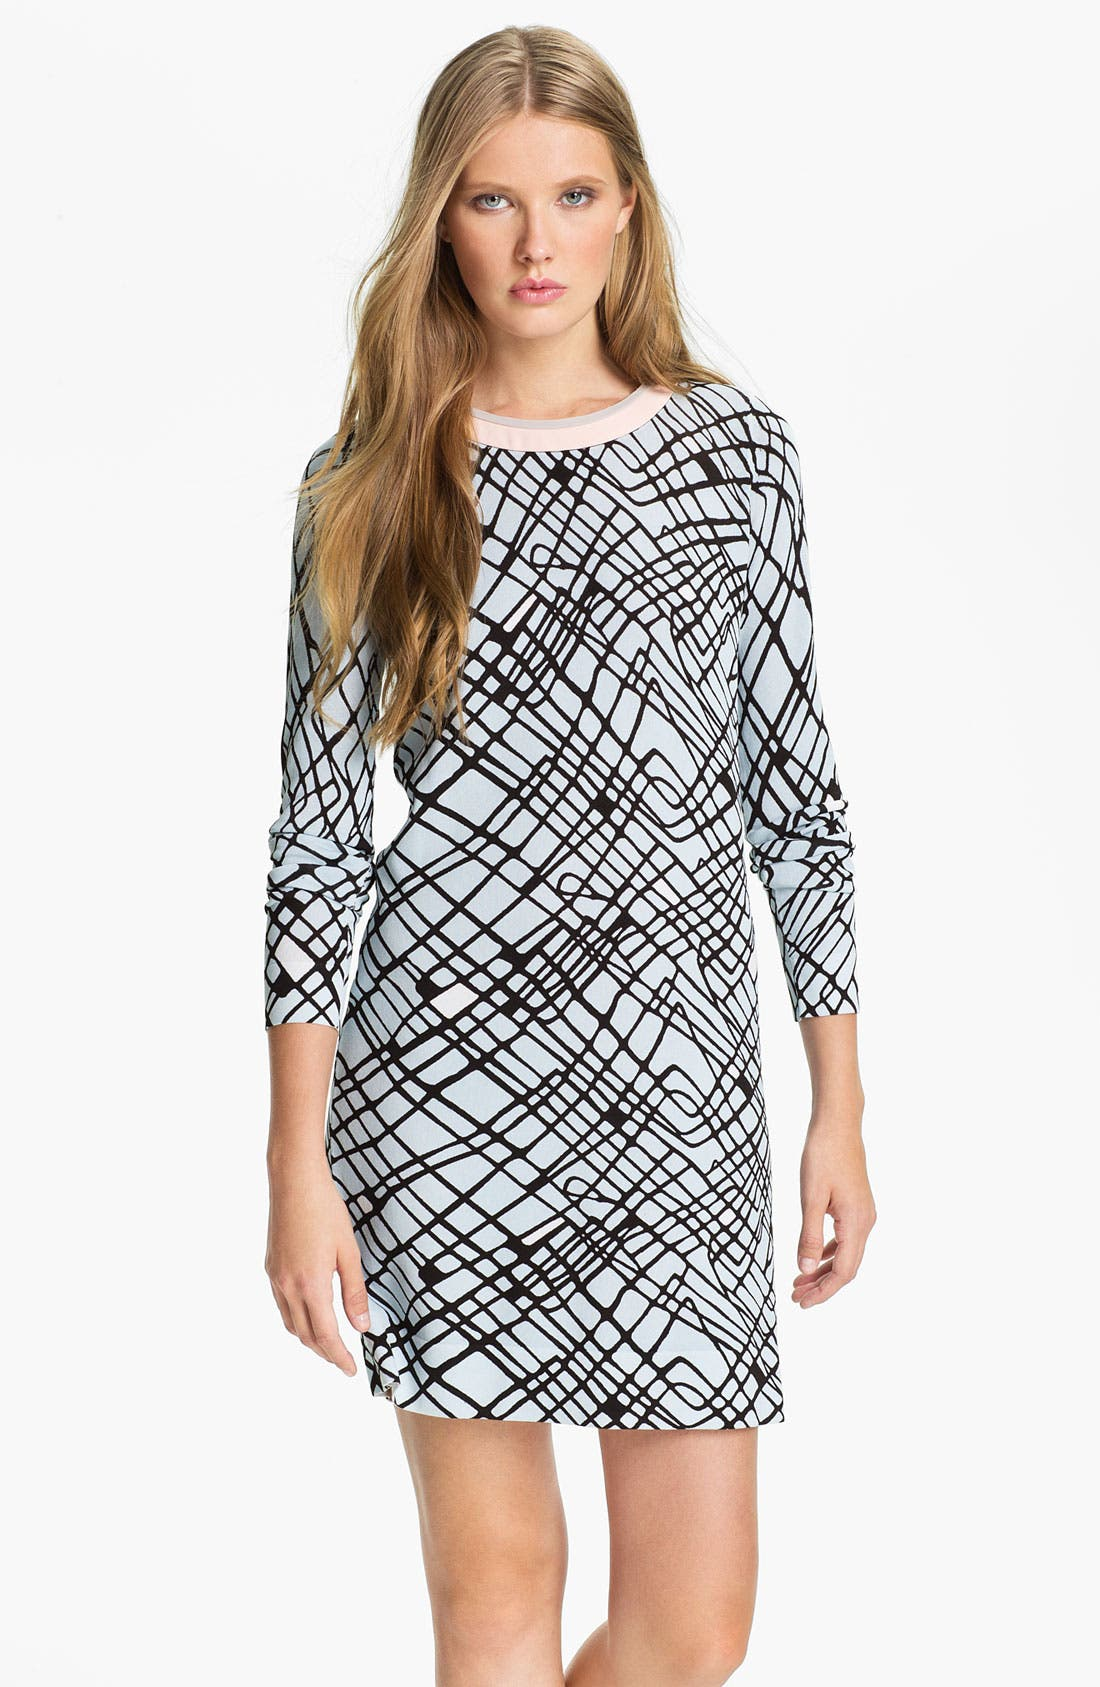 Alternate Image 1 Selected - Diane von Furstenberg 'Janetta' Print Shift Dress